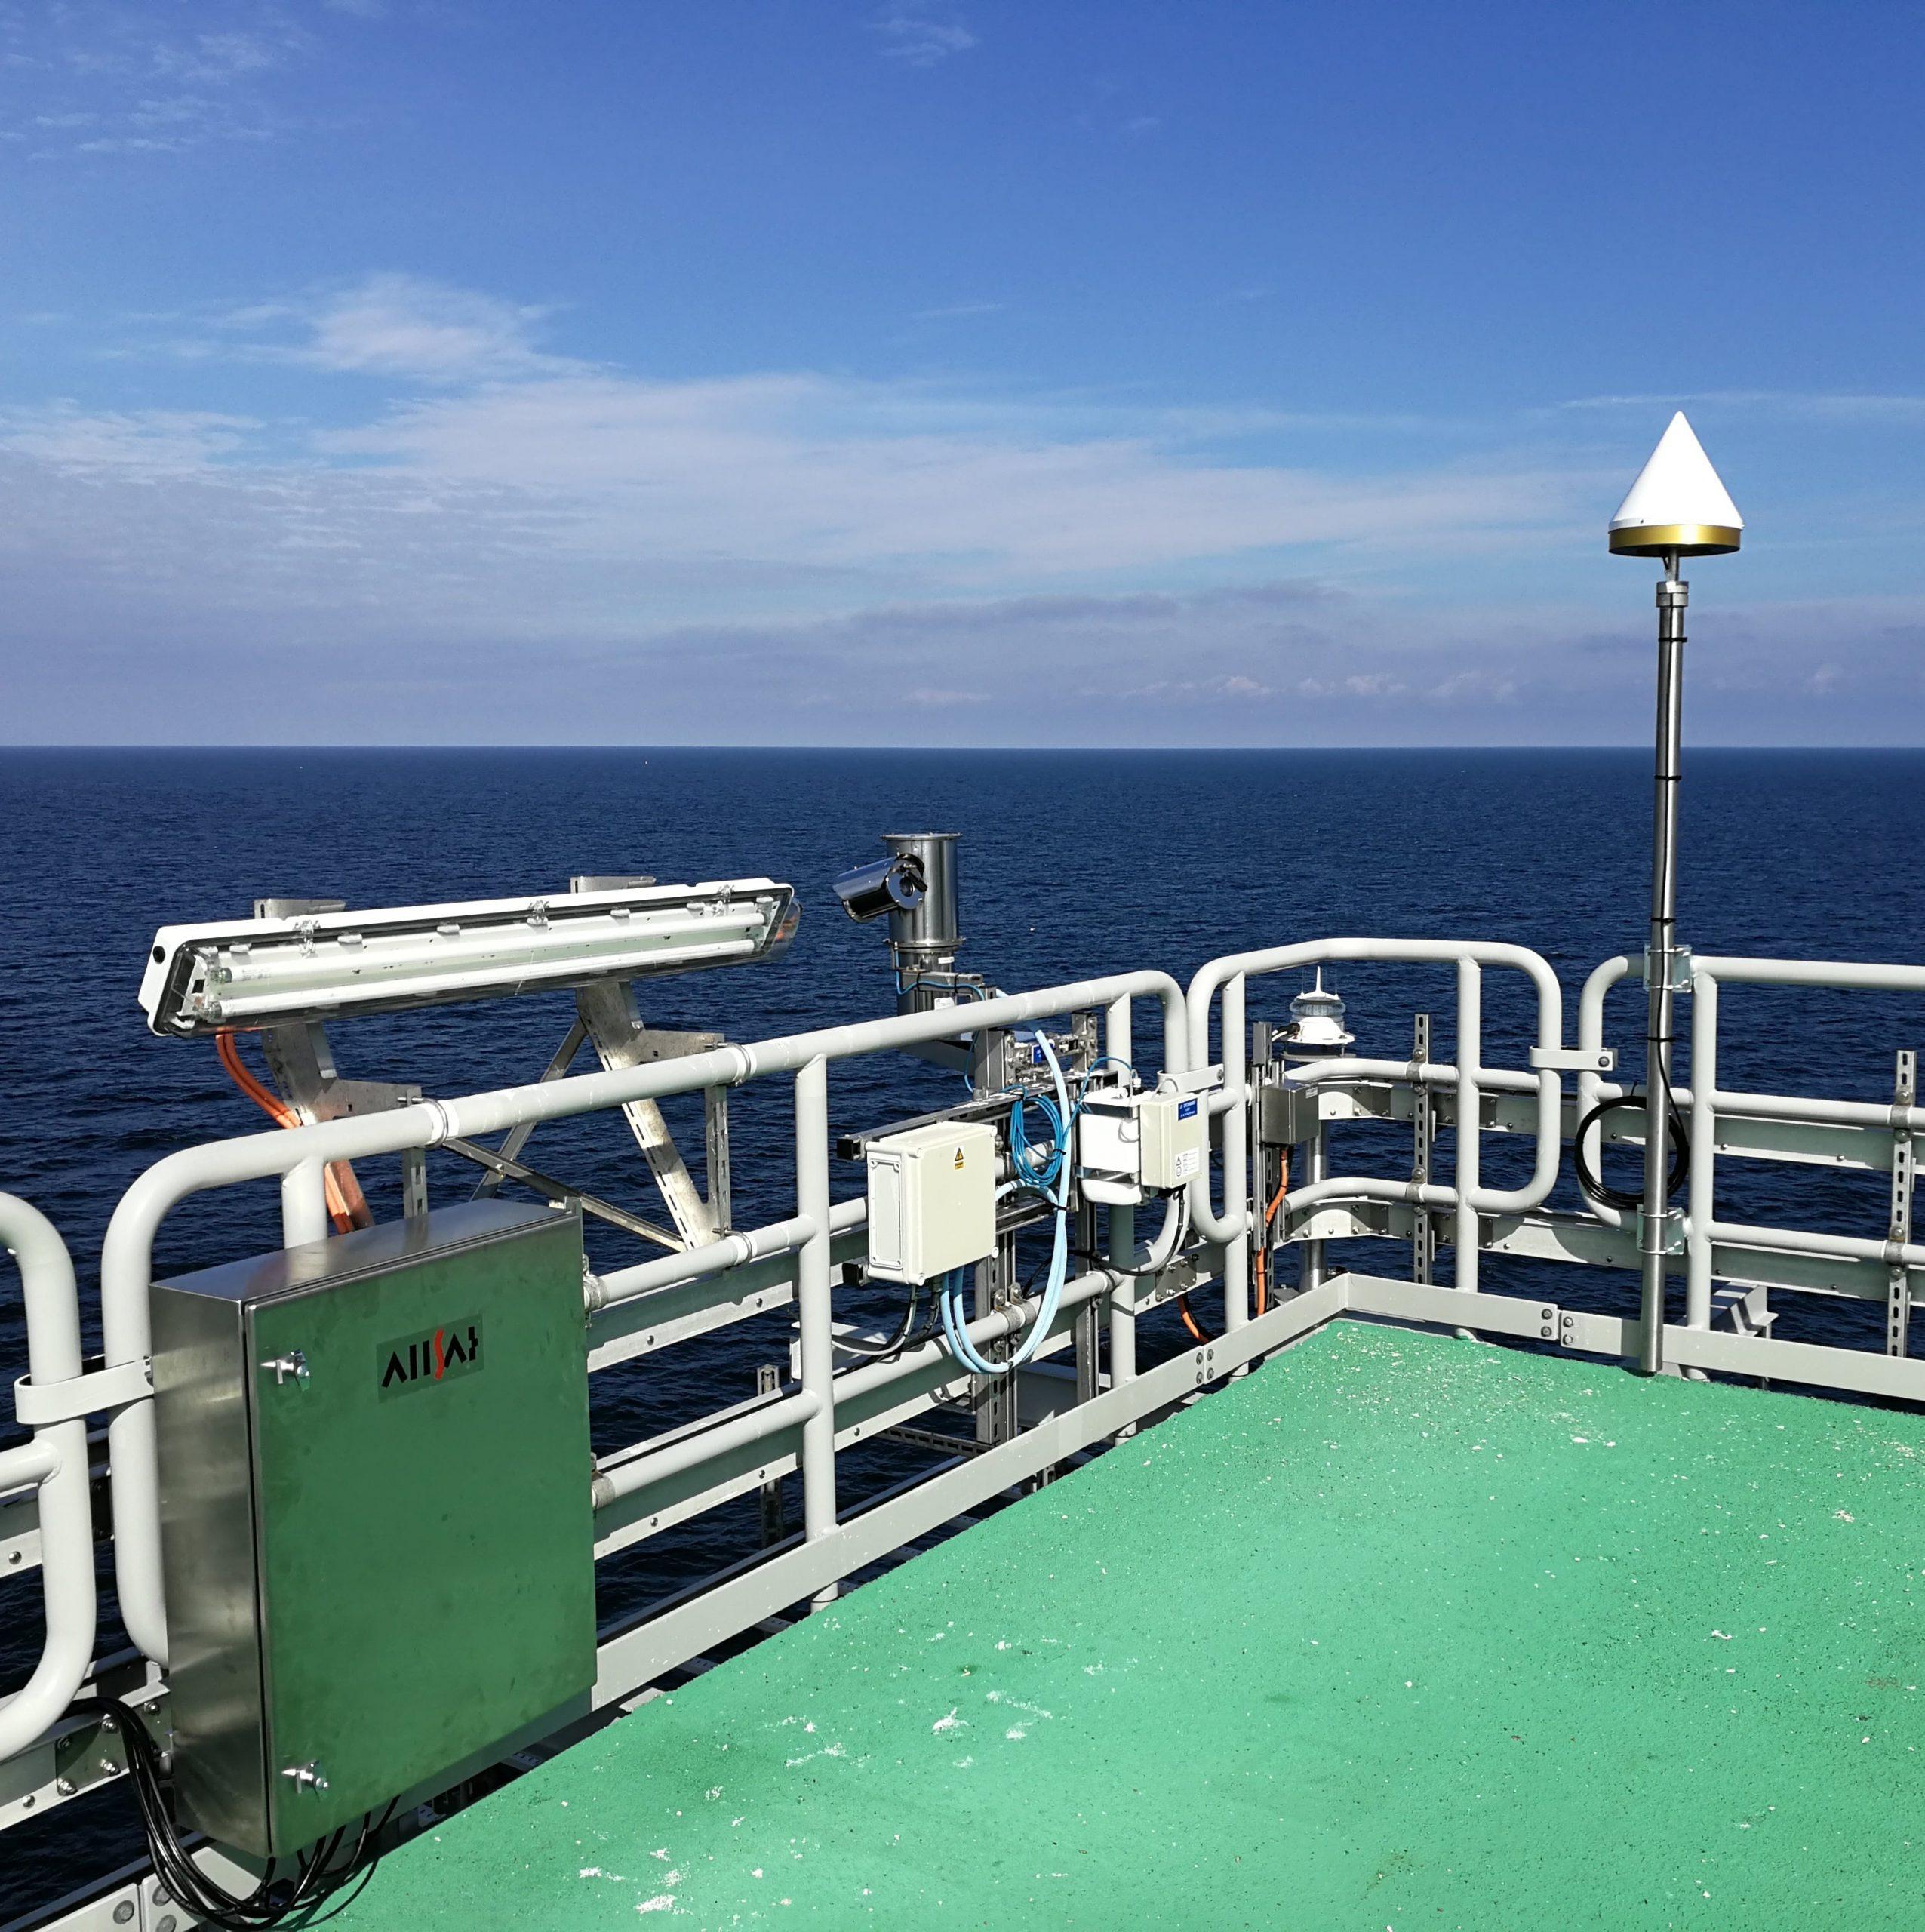 GNSS-Referenzstation auf der Offshore-Plattform OSS Horns Rev 3